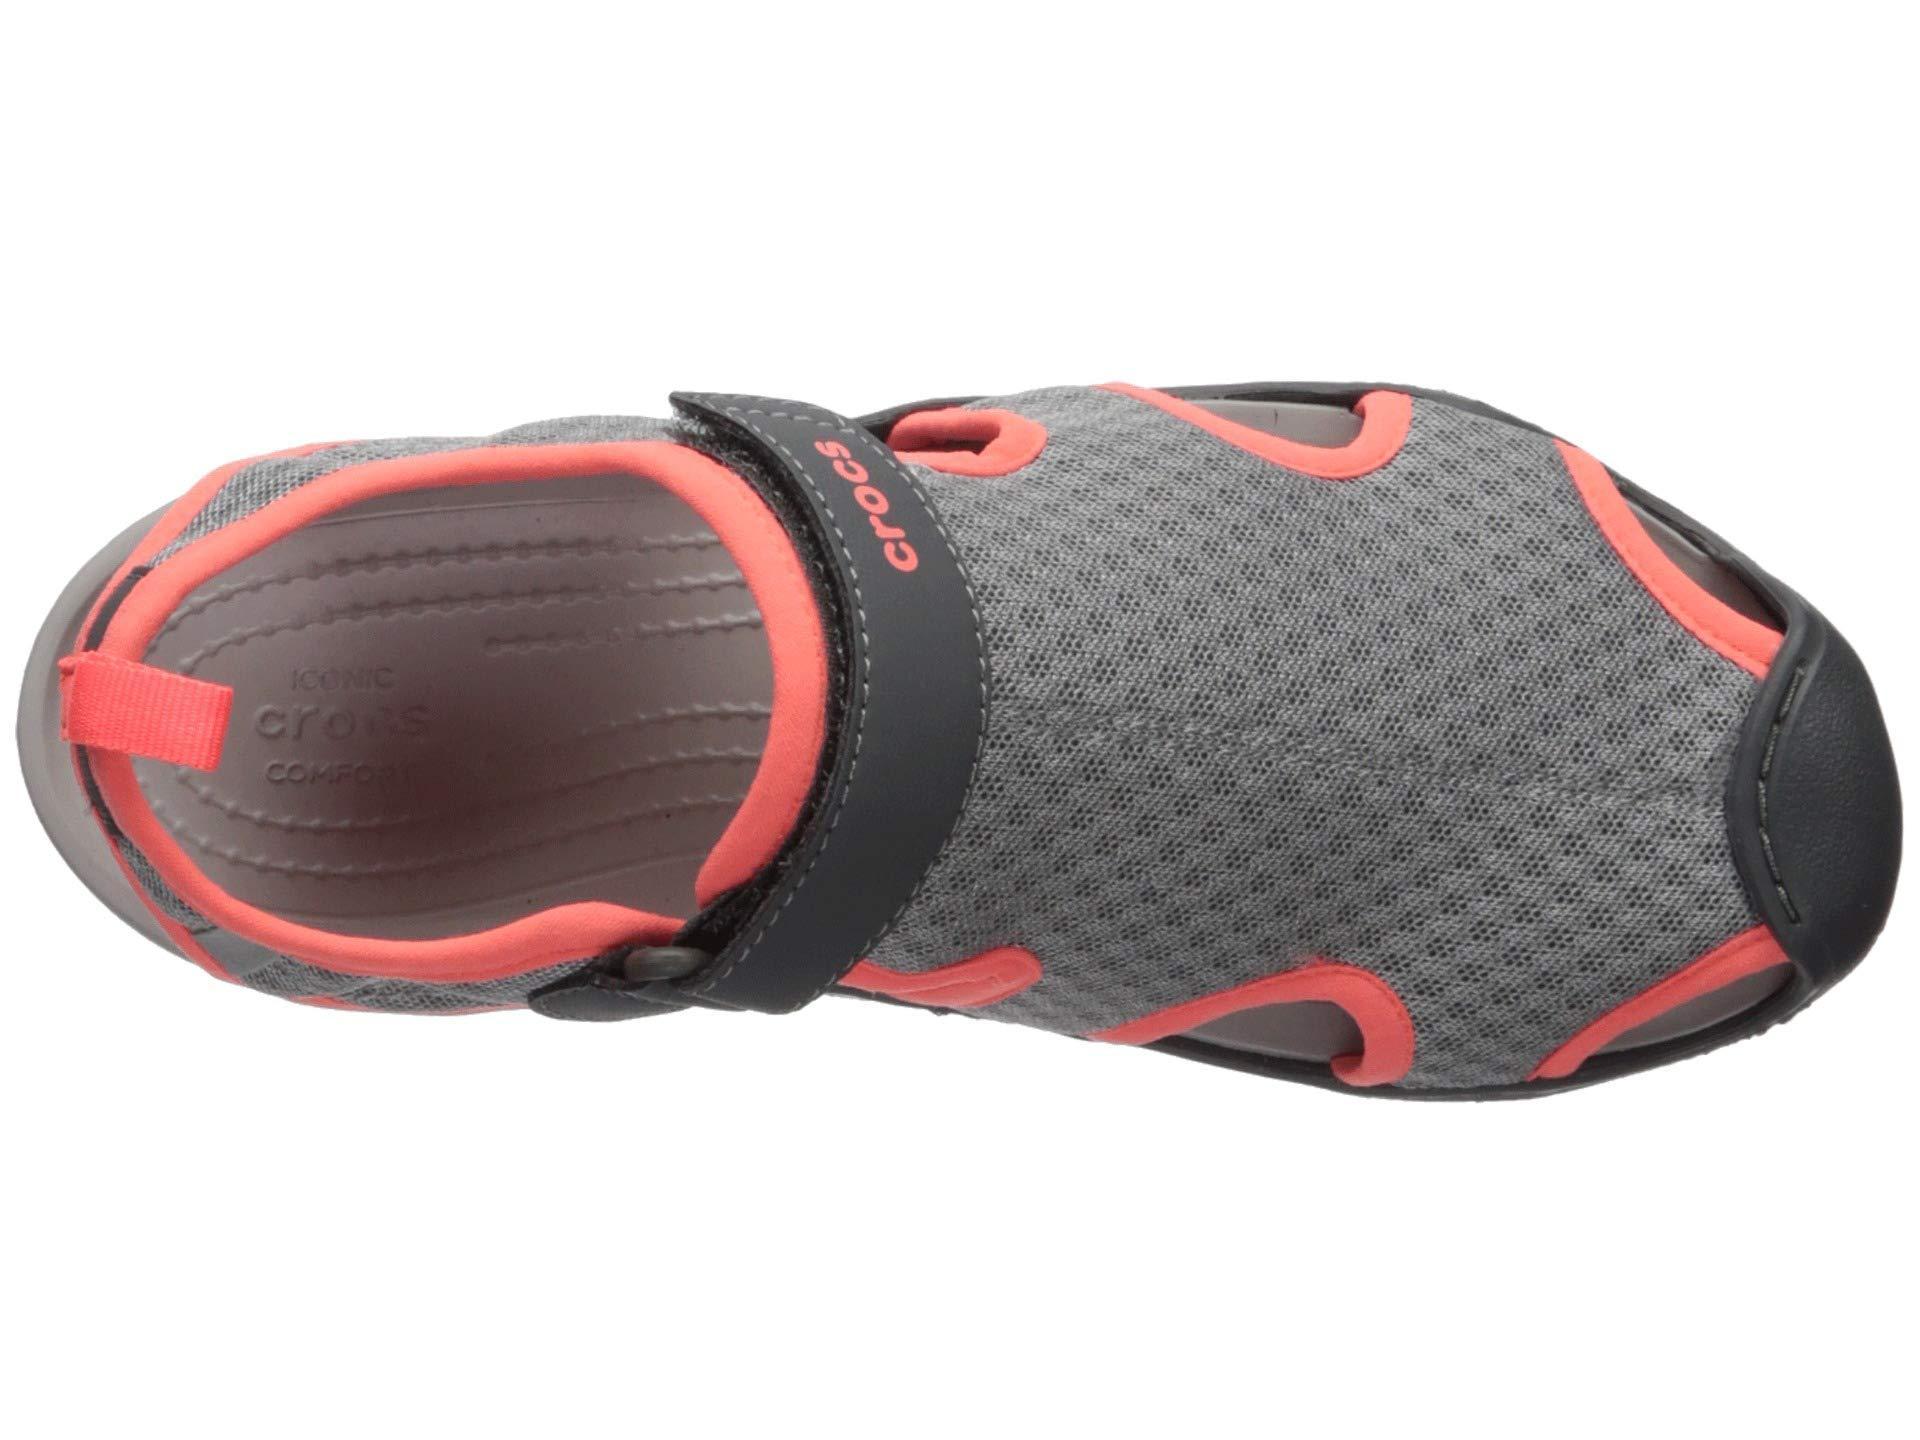 b9da377af0 Crocs™ - Gray Swiftwater Mesh Sandal (black) Women s Sandals - Lyst. View  fullscreen